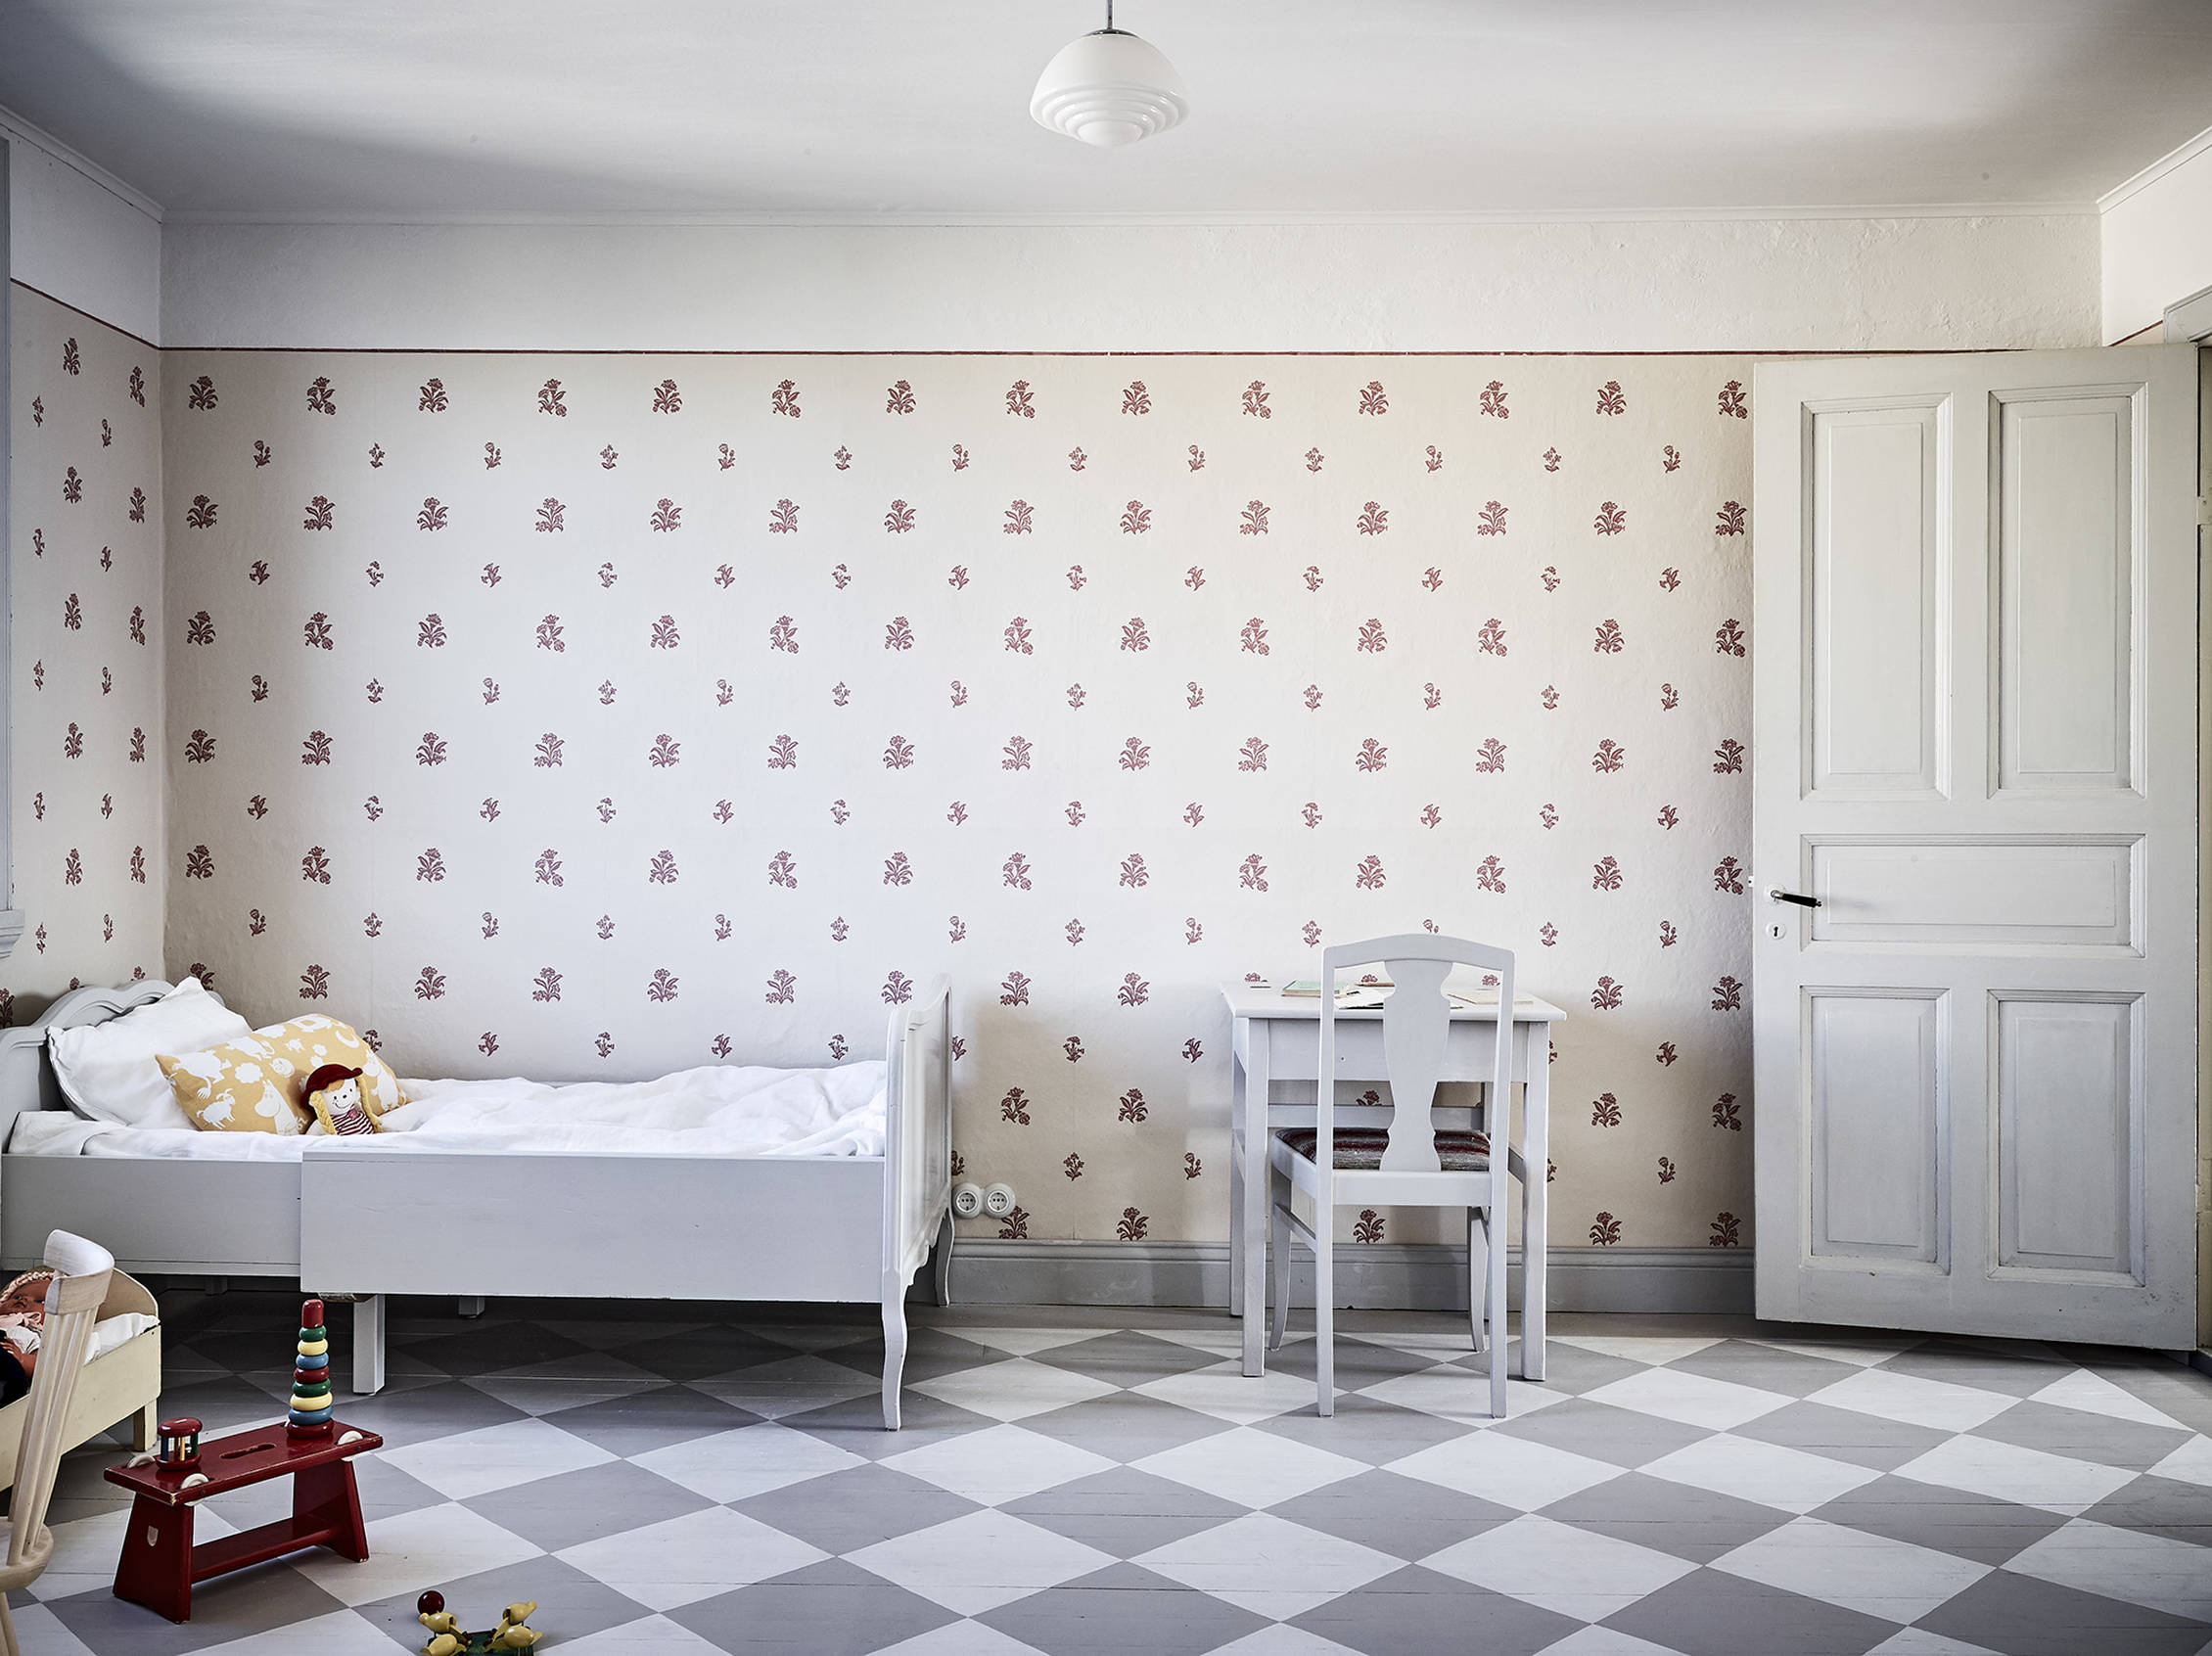 barnrum barnrumsinspiration möbler stadshem